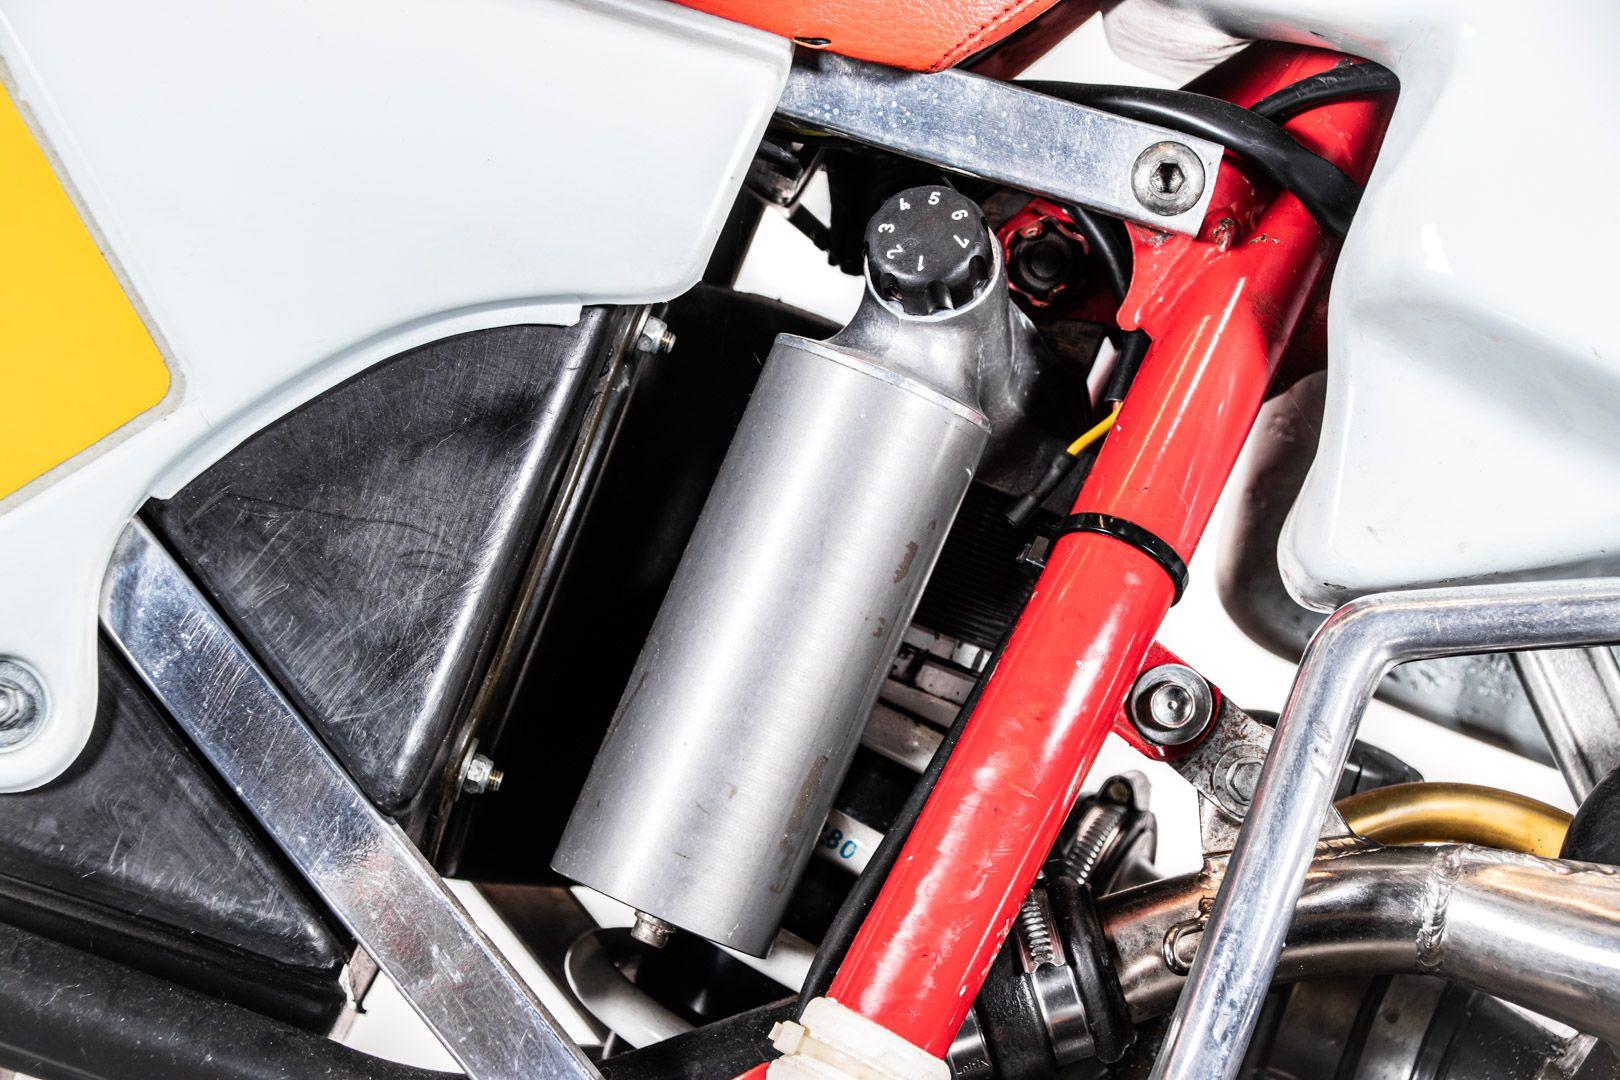 1991 KTM GS 250 82497